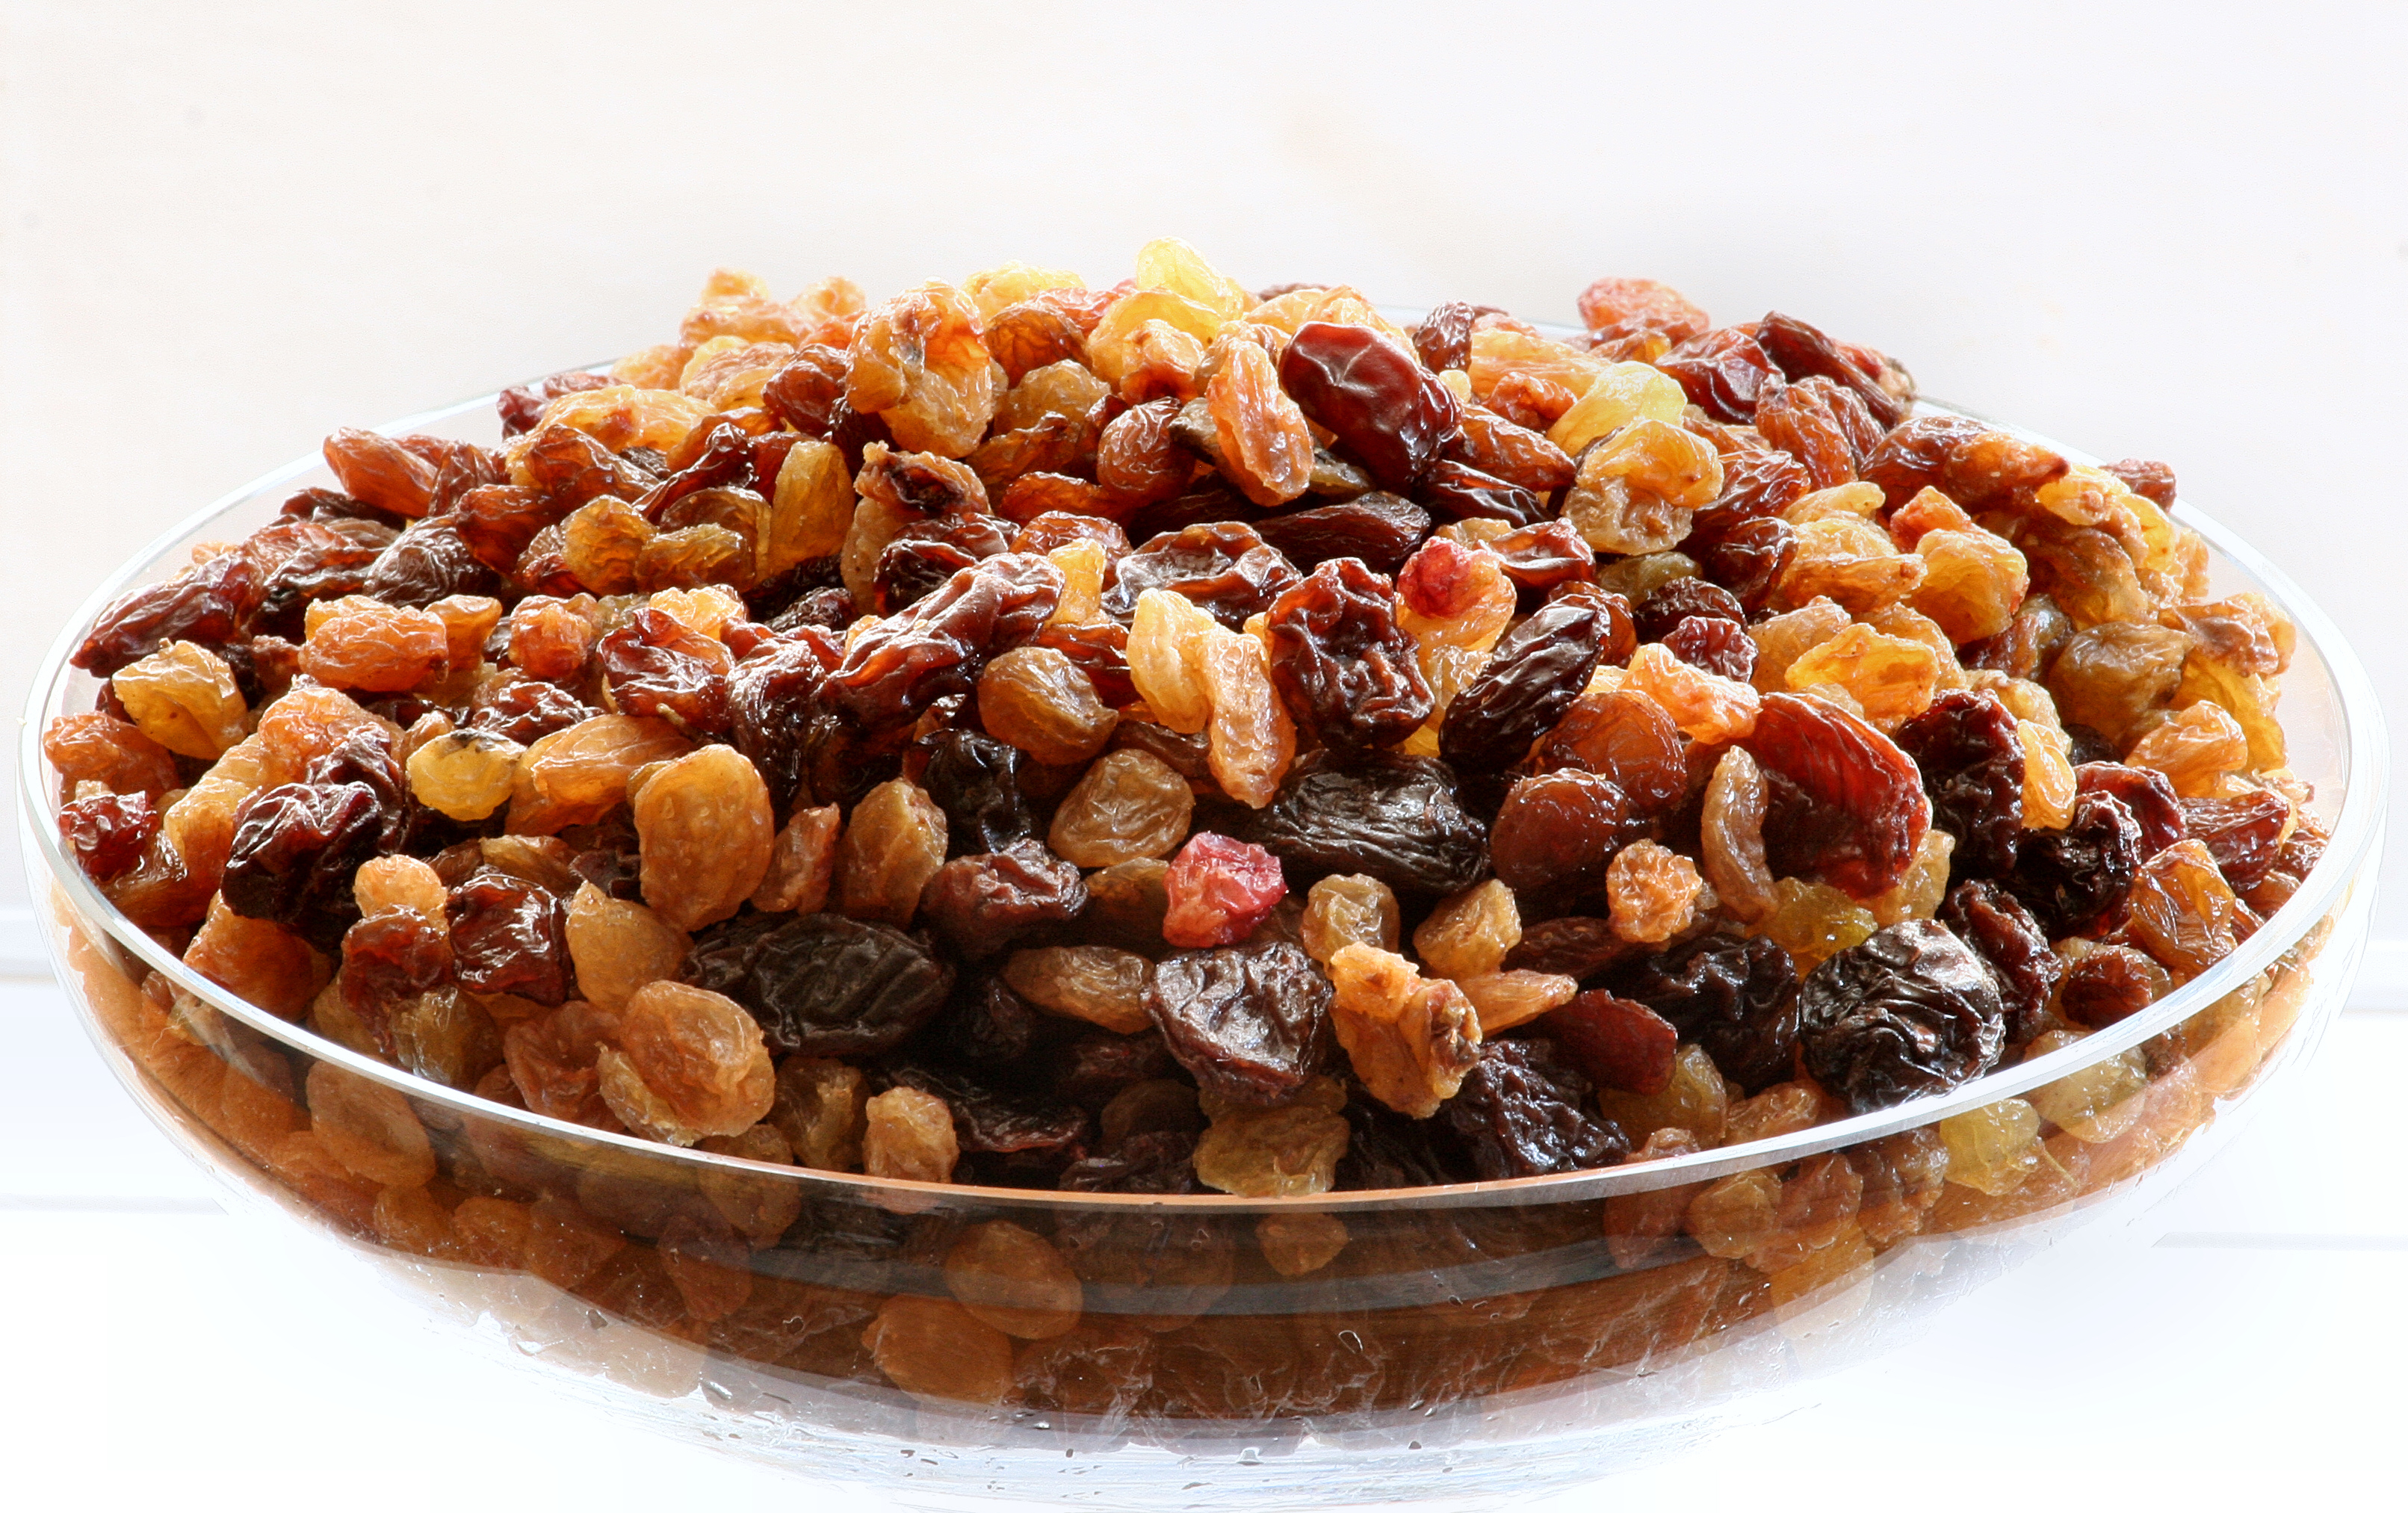 Raisins-online dry fruits store